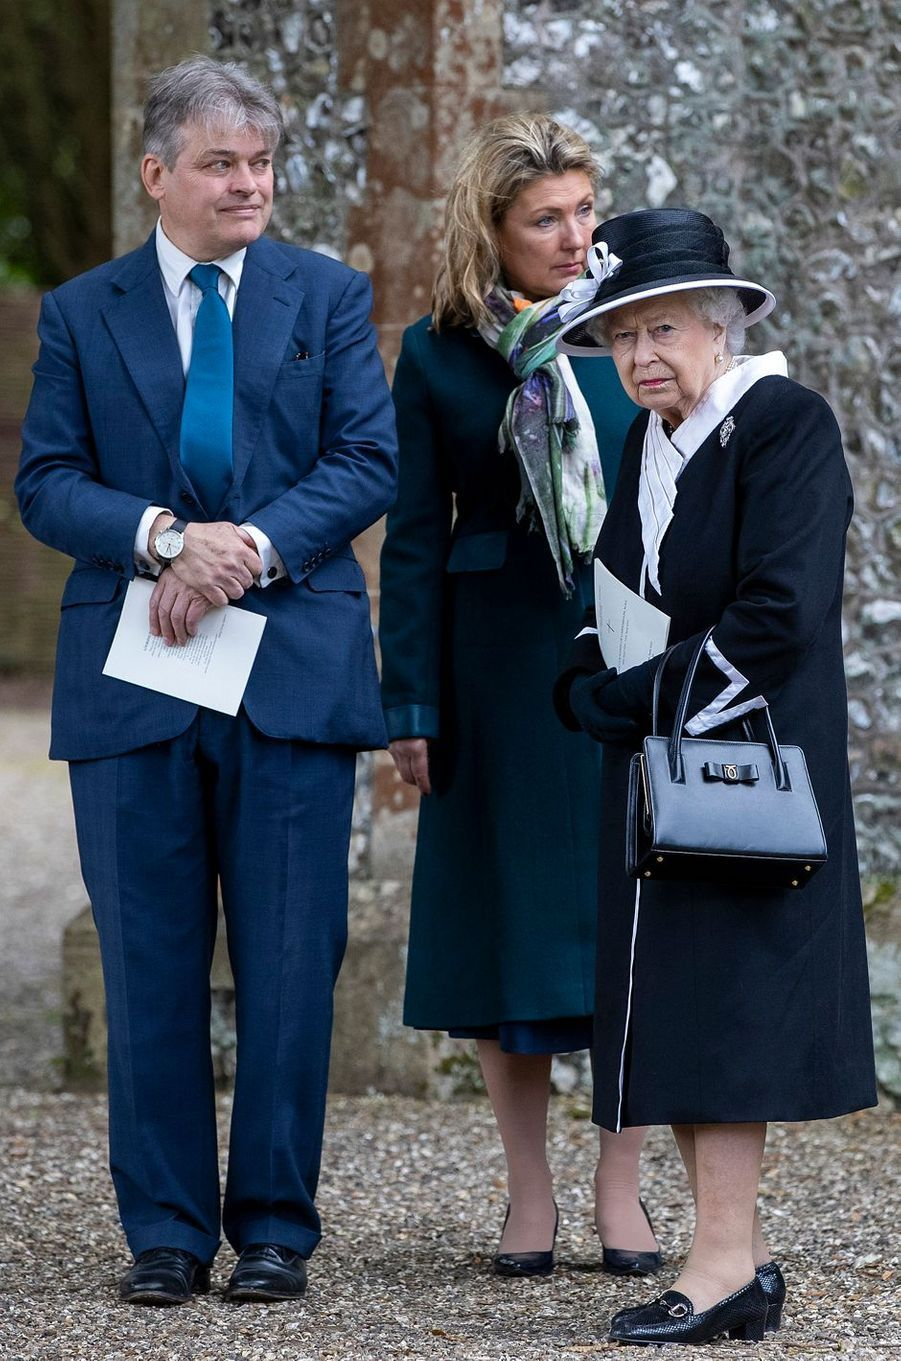 La reine Elizabeth II avec son filleul George Herbert, à Highclere, le 25 avril 2019